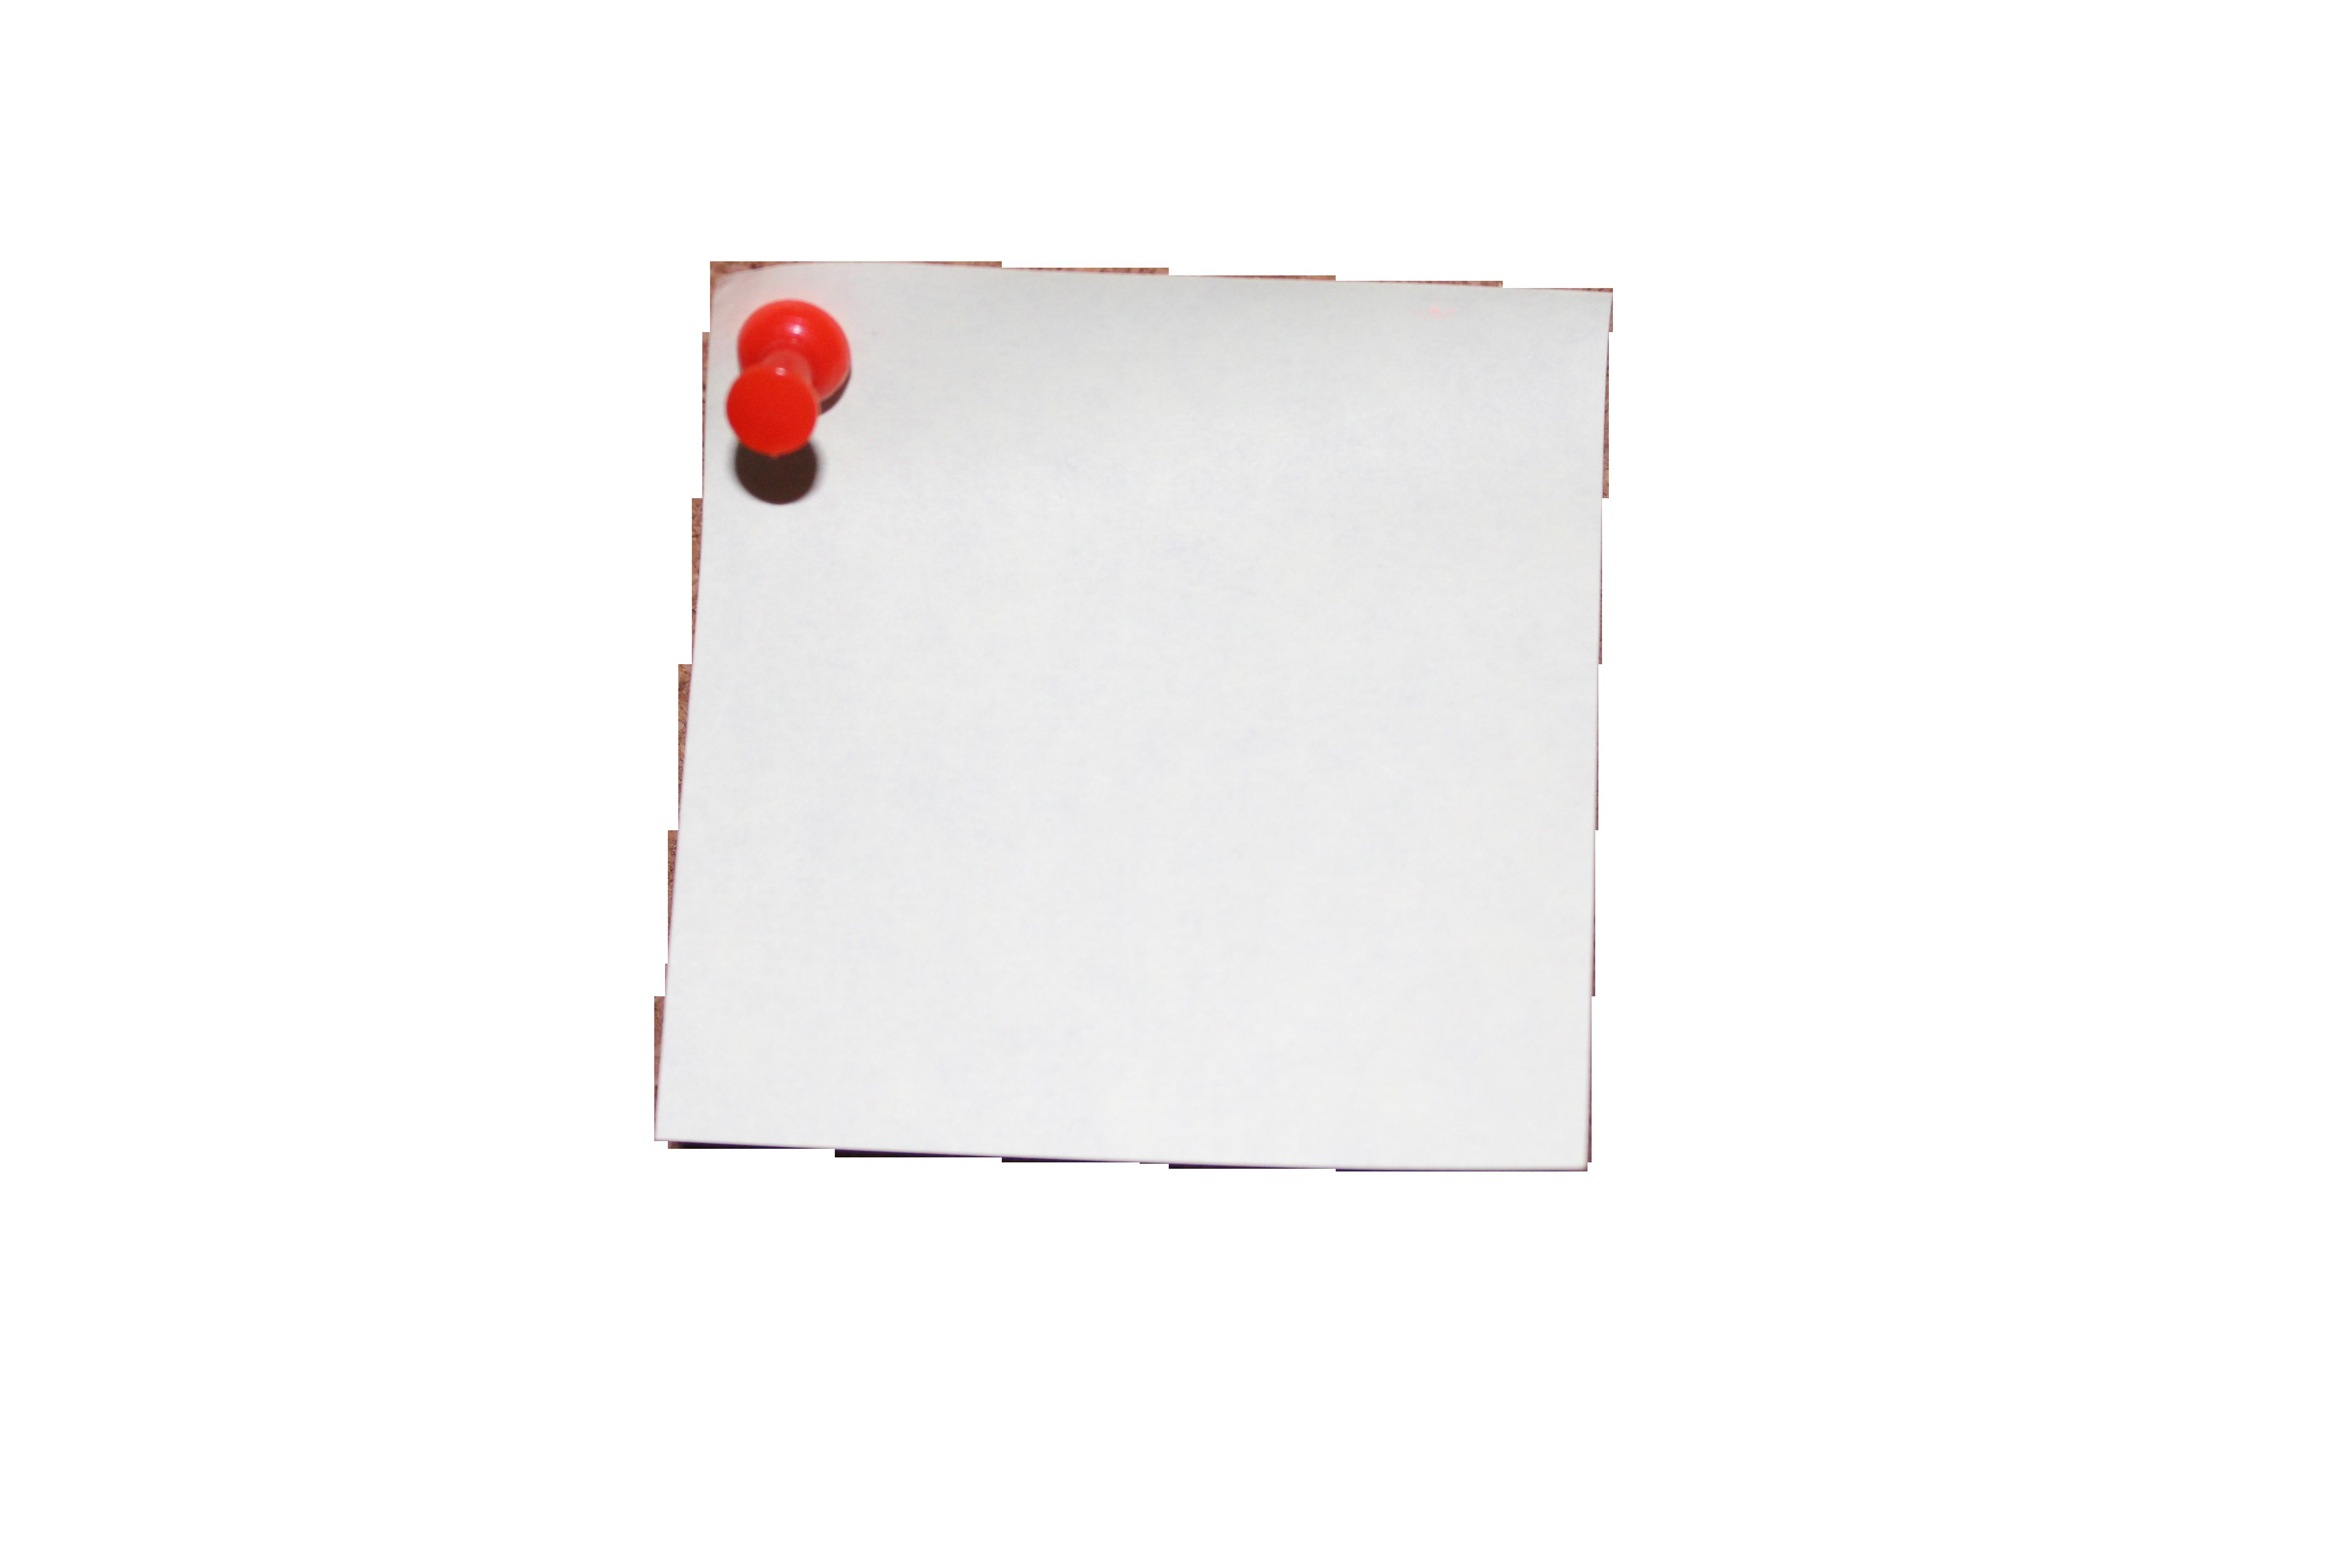 note-1143037_Clip